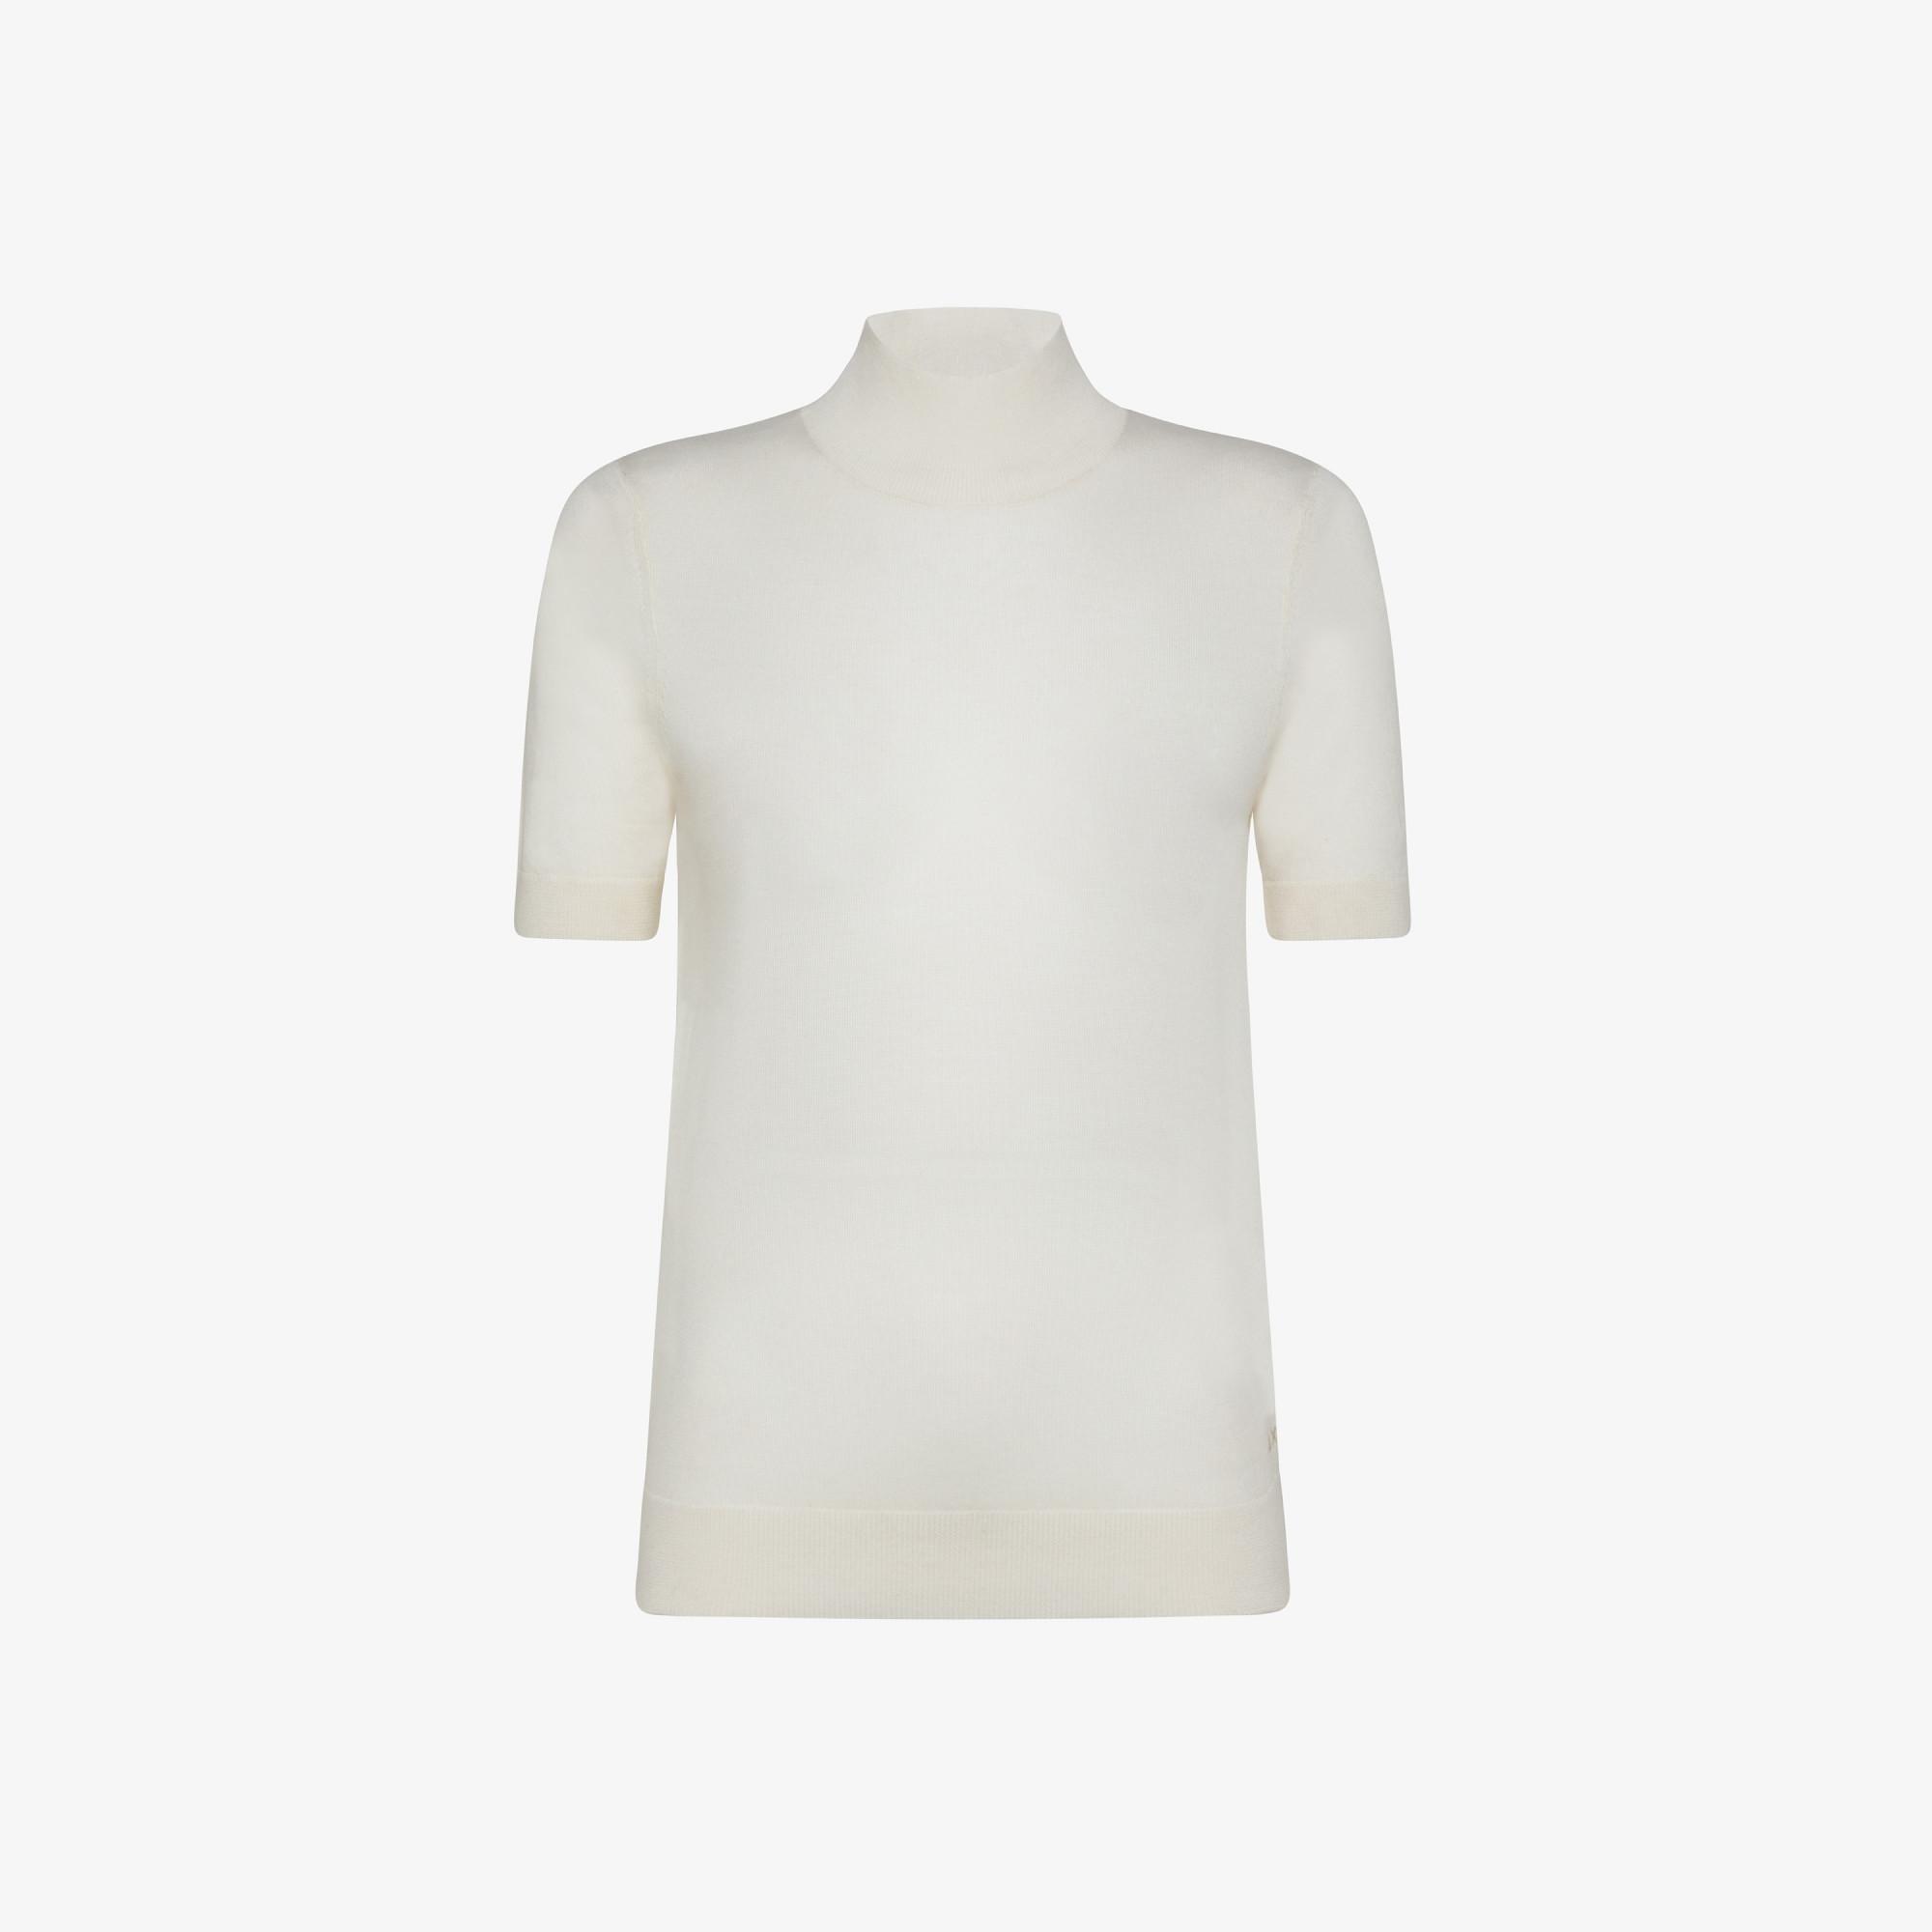 KNIT T-SHIRT HIGH NECK MERINOS S/S PORCELAIN